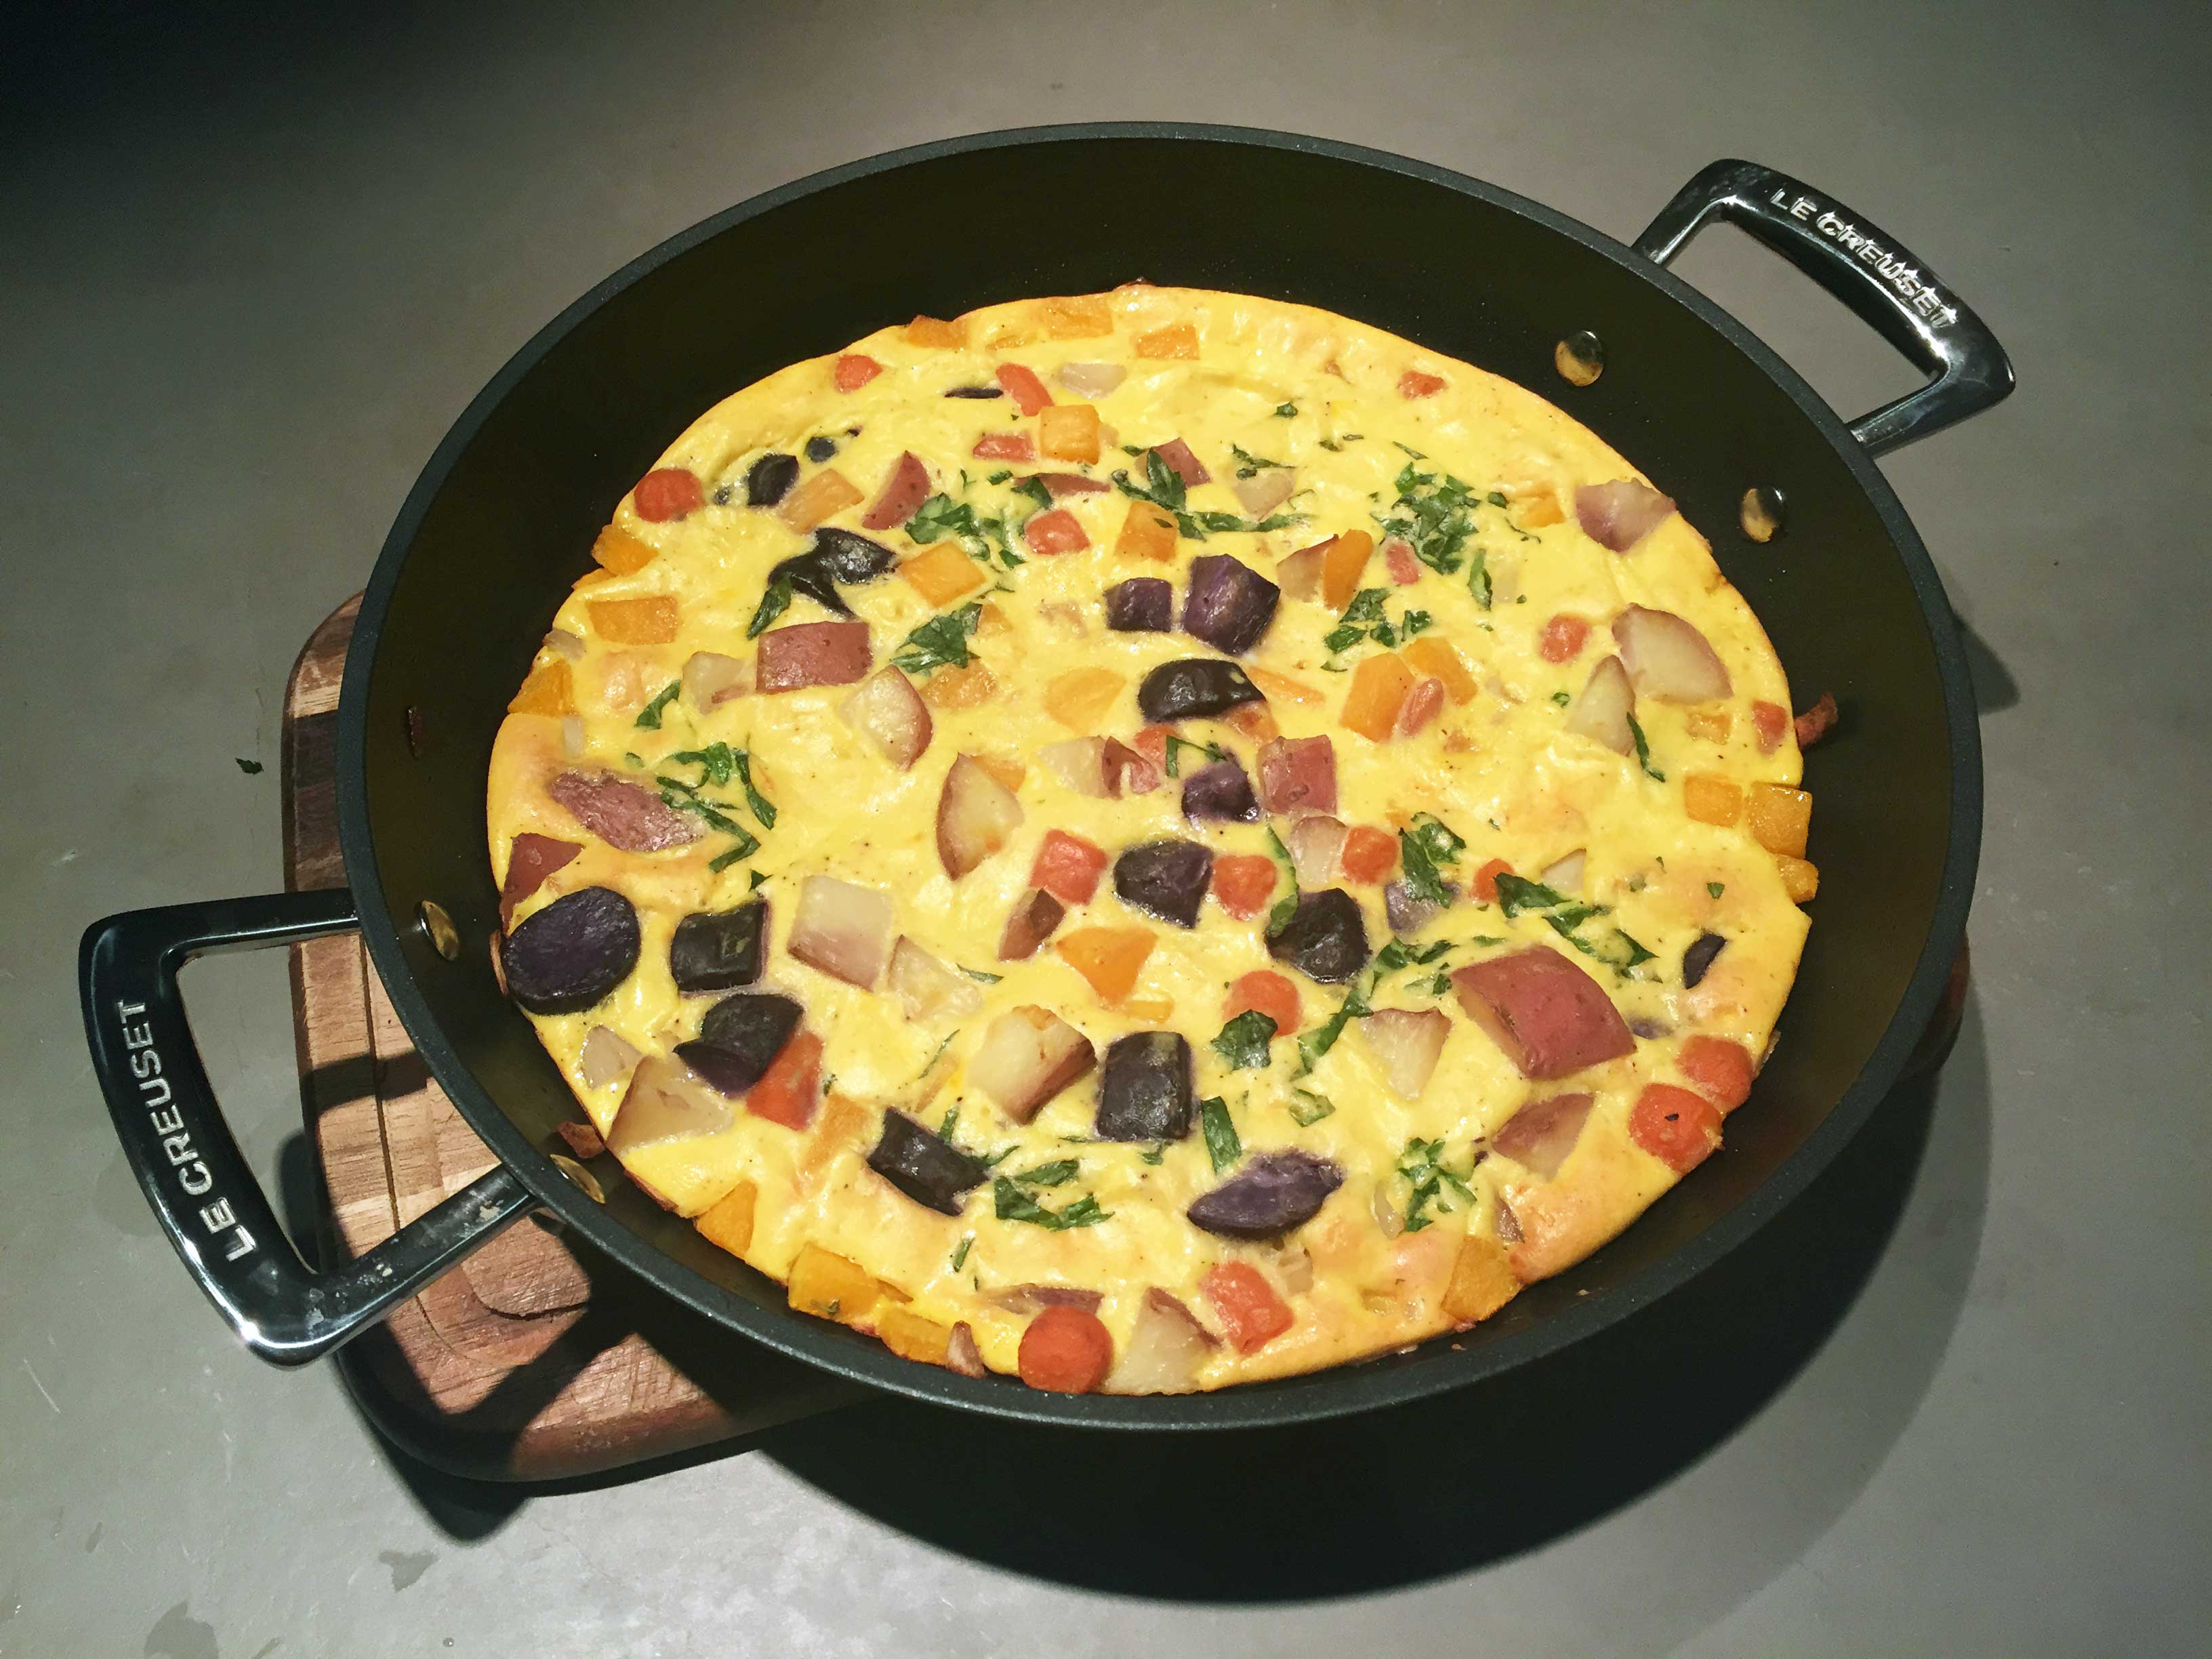 Frittata-pompoen-aardappel-recept-ChefErnst